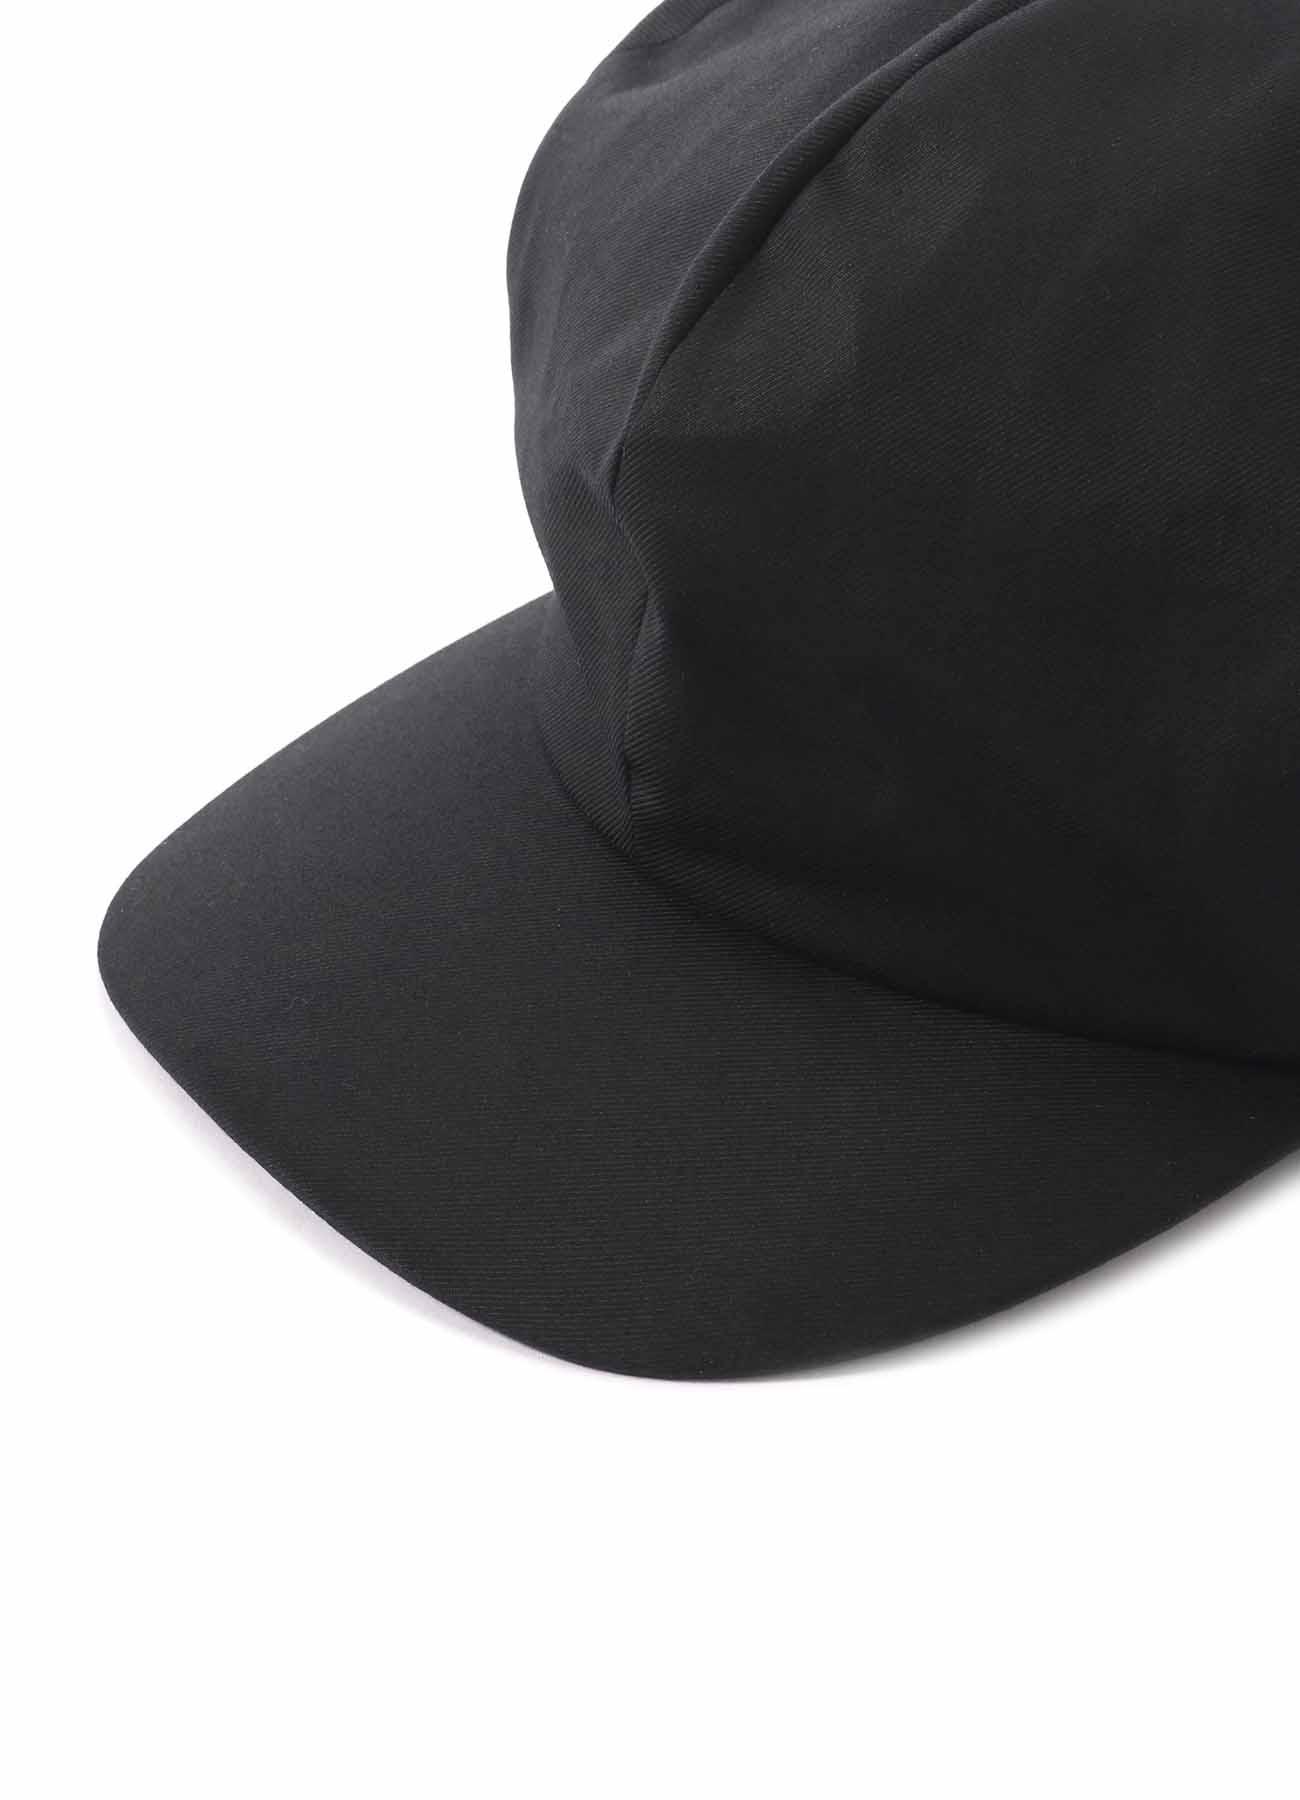 SUPIMA COTTON 60/3 LAYERED NEWSBOY CAP